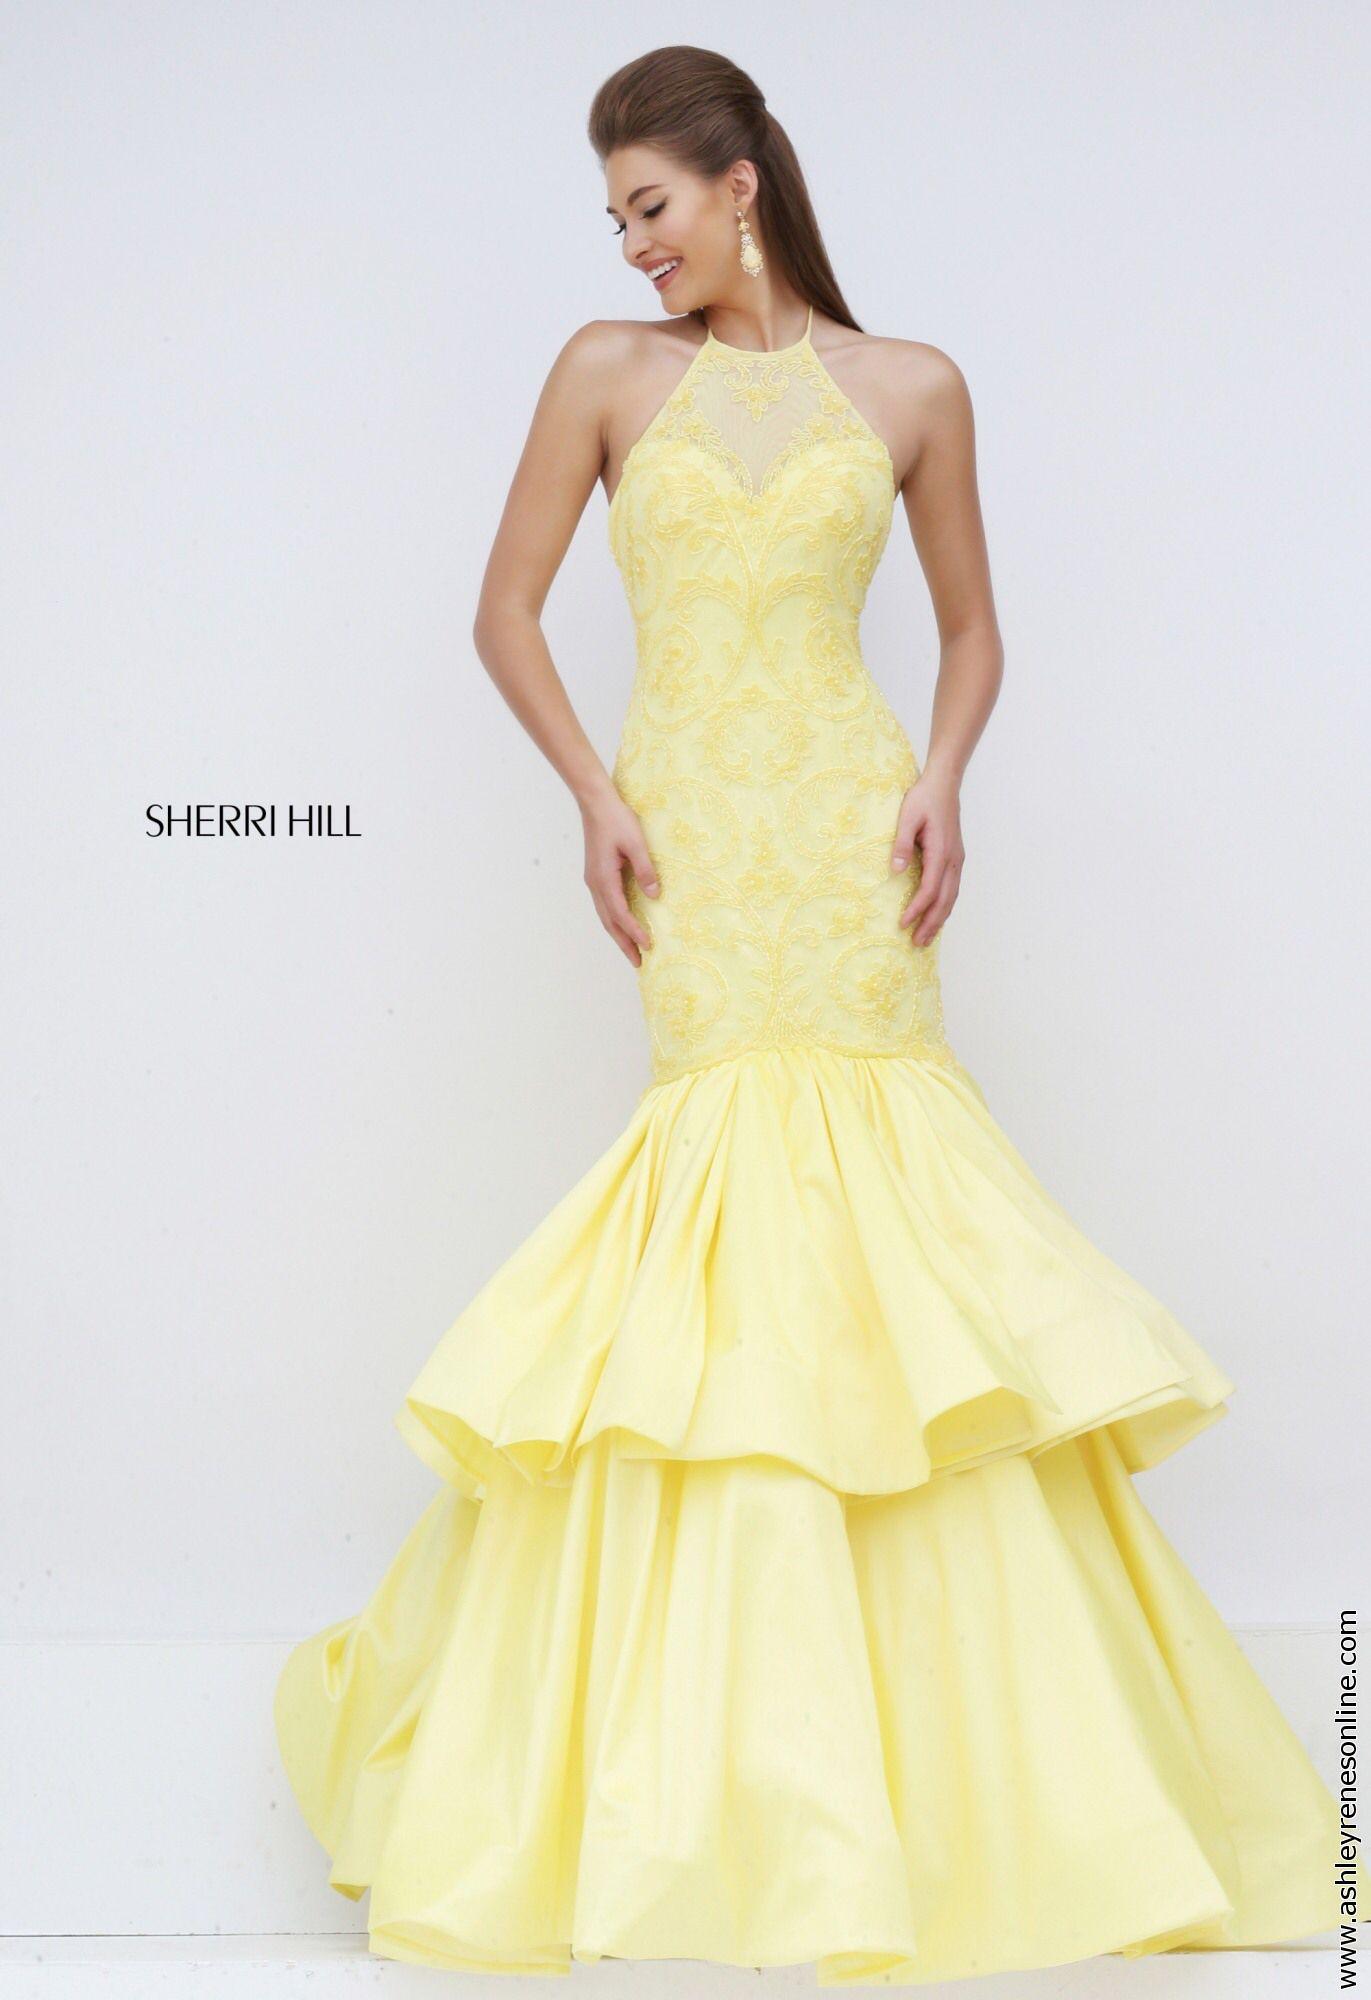 Sherri hill yellow prom dress at ashley reneus elkhart in